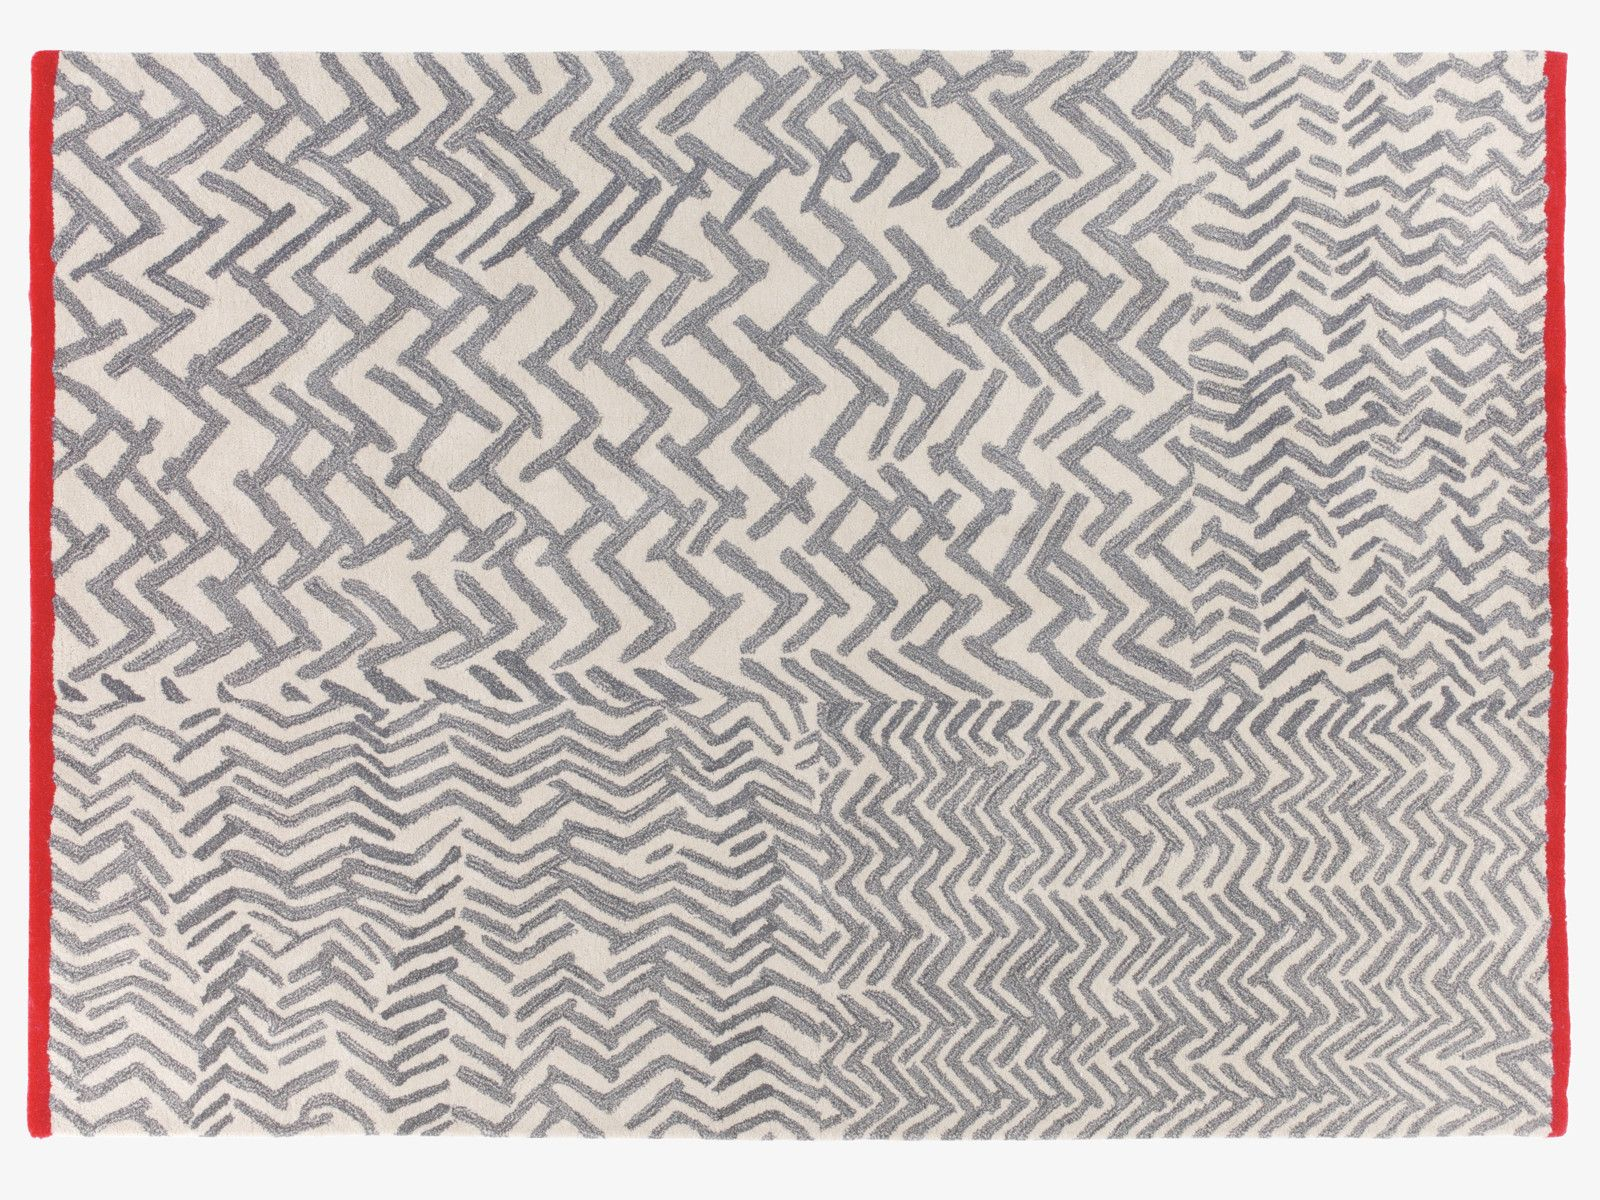 Malbrook Greys Wool Large Grey Wool Rug 170 X 240cm Habitatuk Large Wool Rugs Grey Wool Rugs Wool Rug